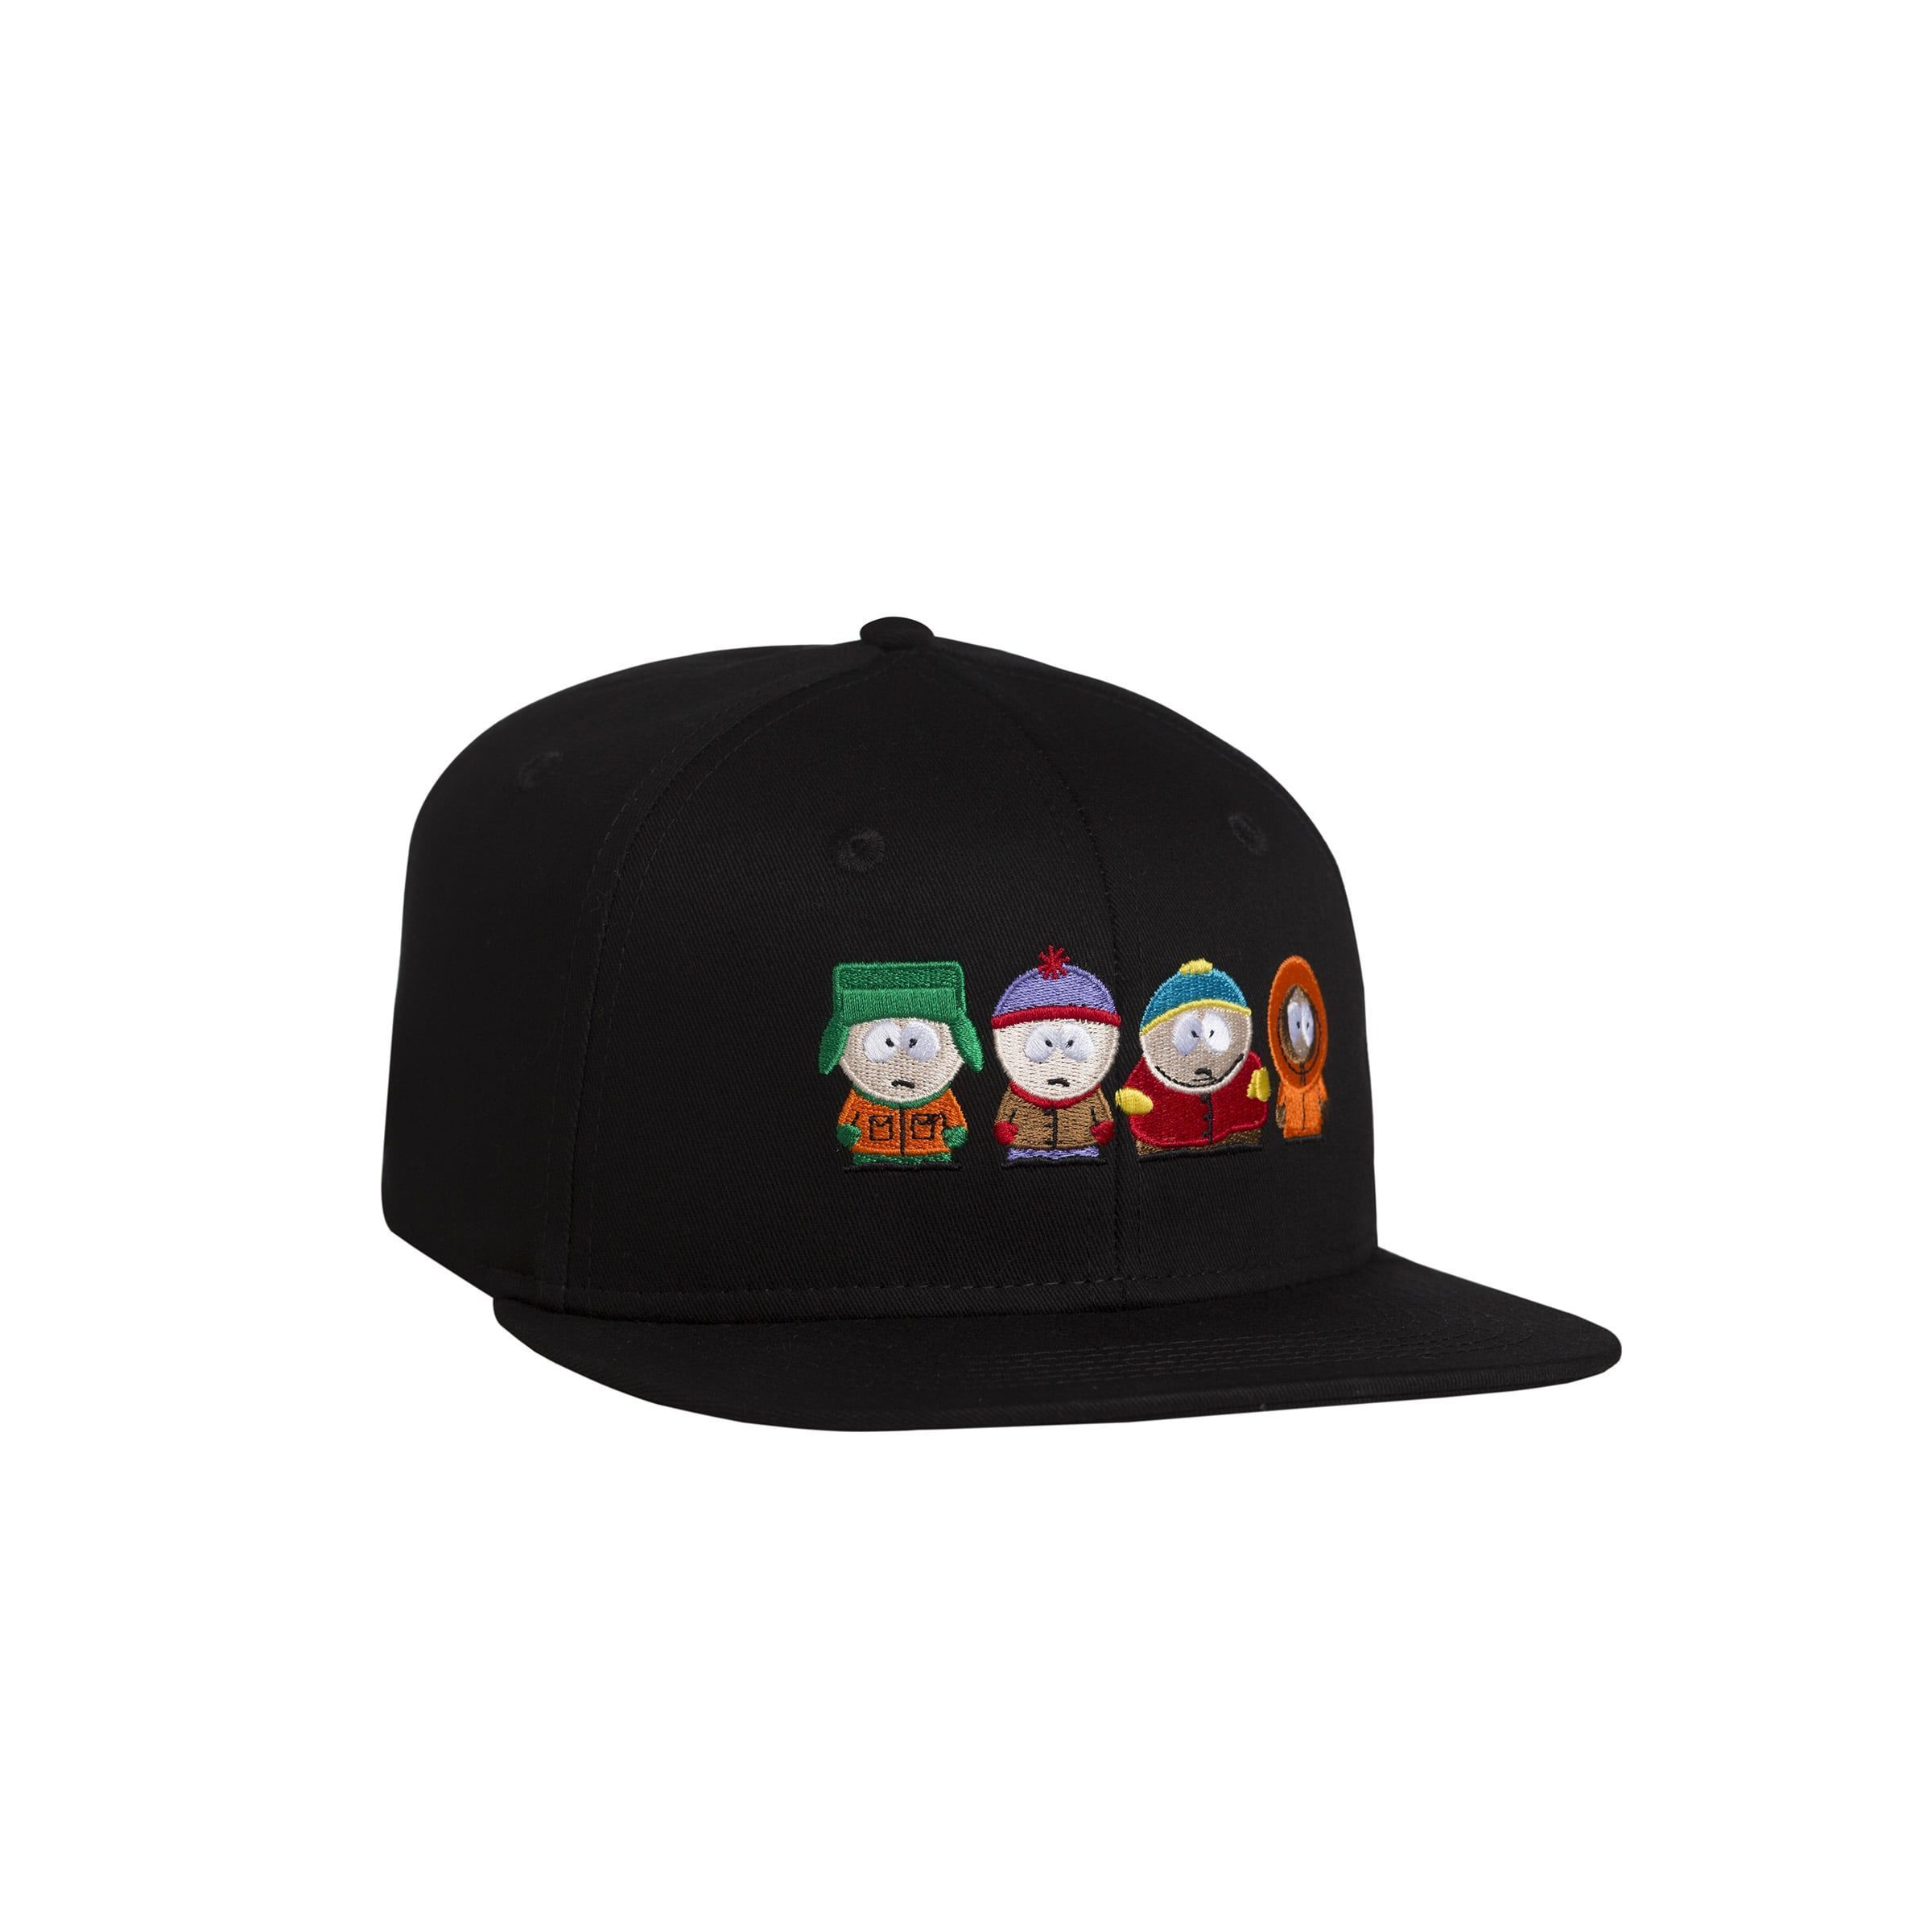 New HUF x South Park Kids Mens Strapback Cap Hat